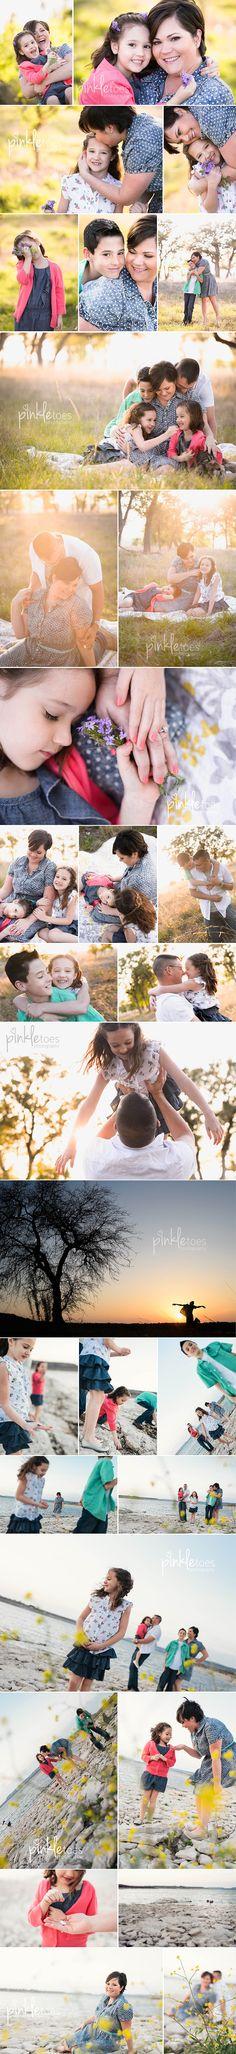 ls-pinkle-toes-austin-family-lifestyle-photographer-park-salado